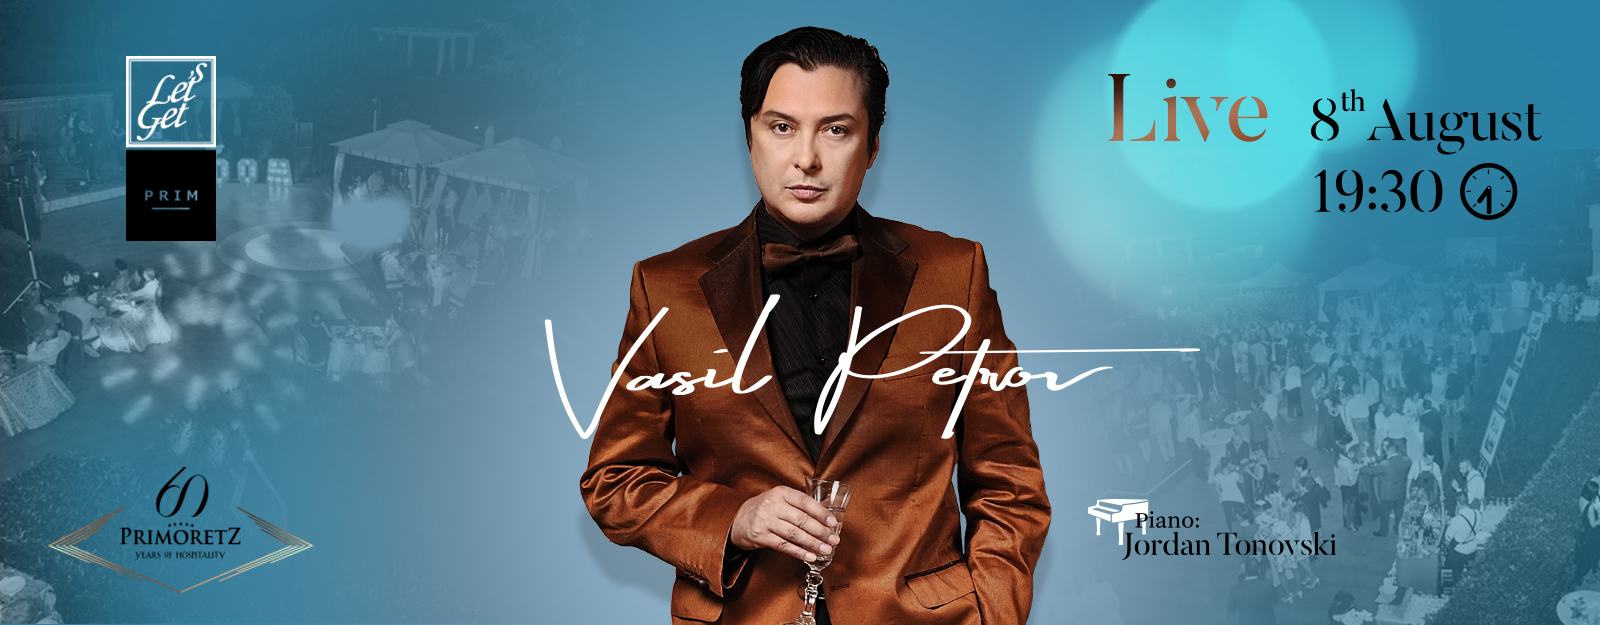 Let's Get PRIM: Vasil Petrov Live